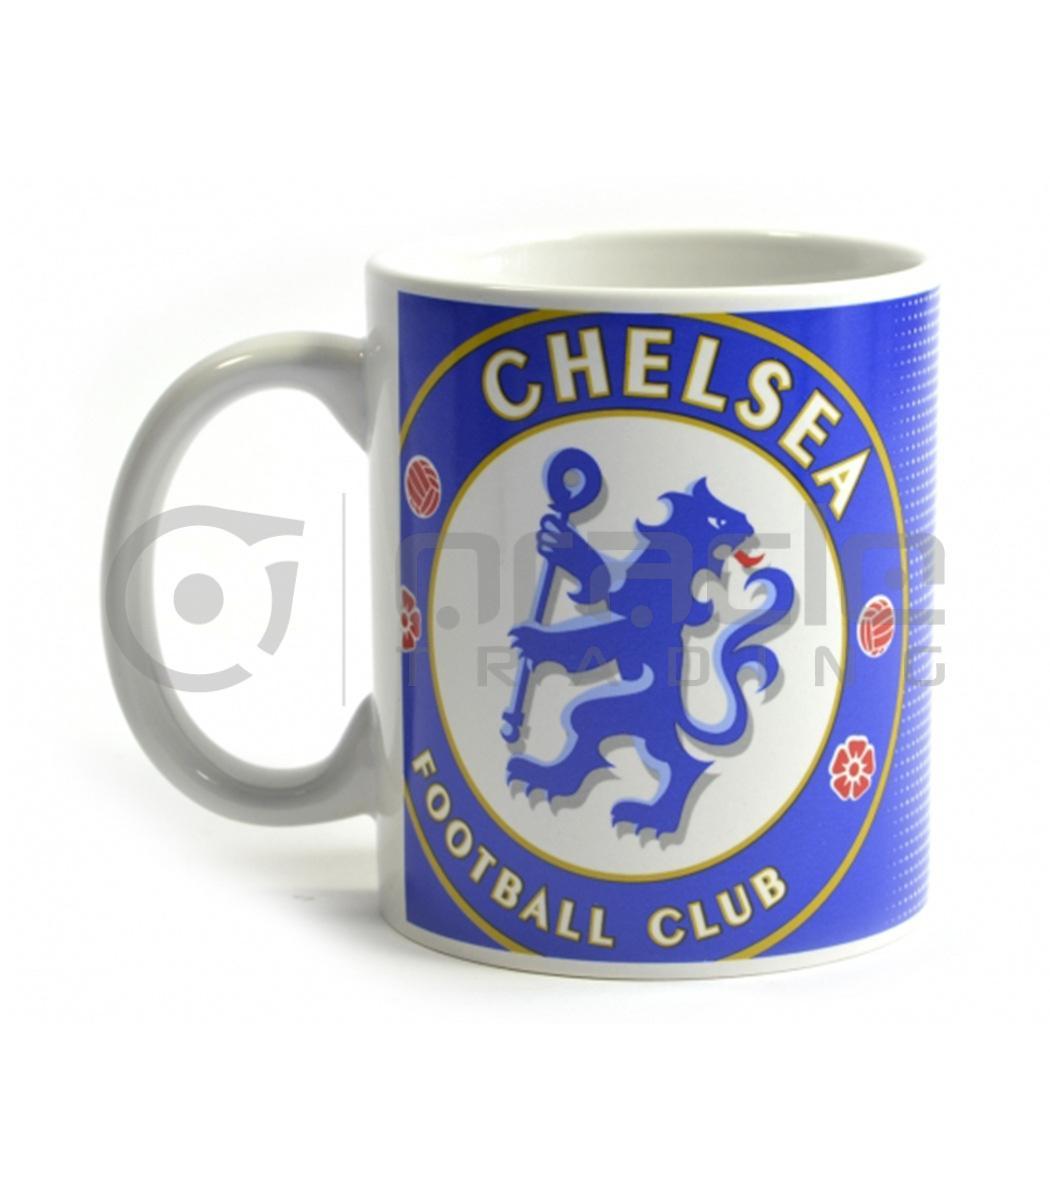 Chelsea Mug - Crest